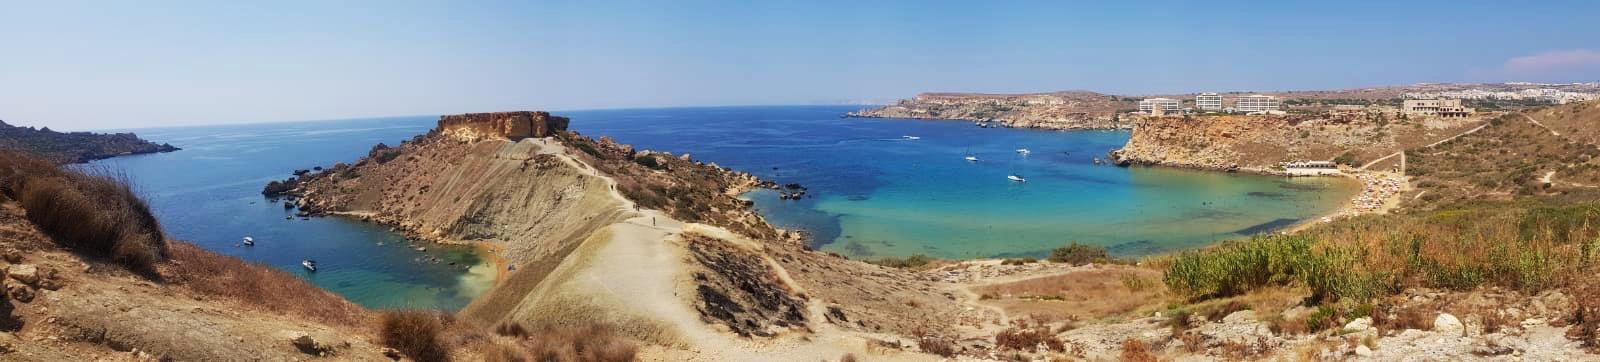 Malta. It's alright.  Photo: Julius Naim